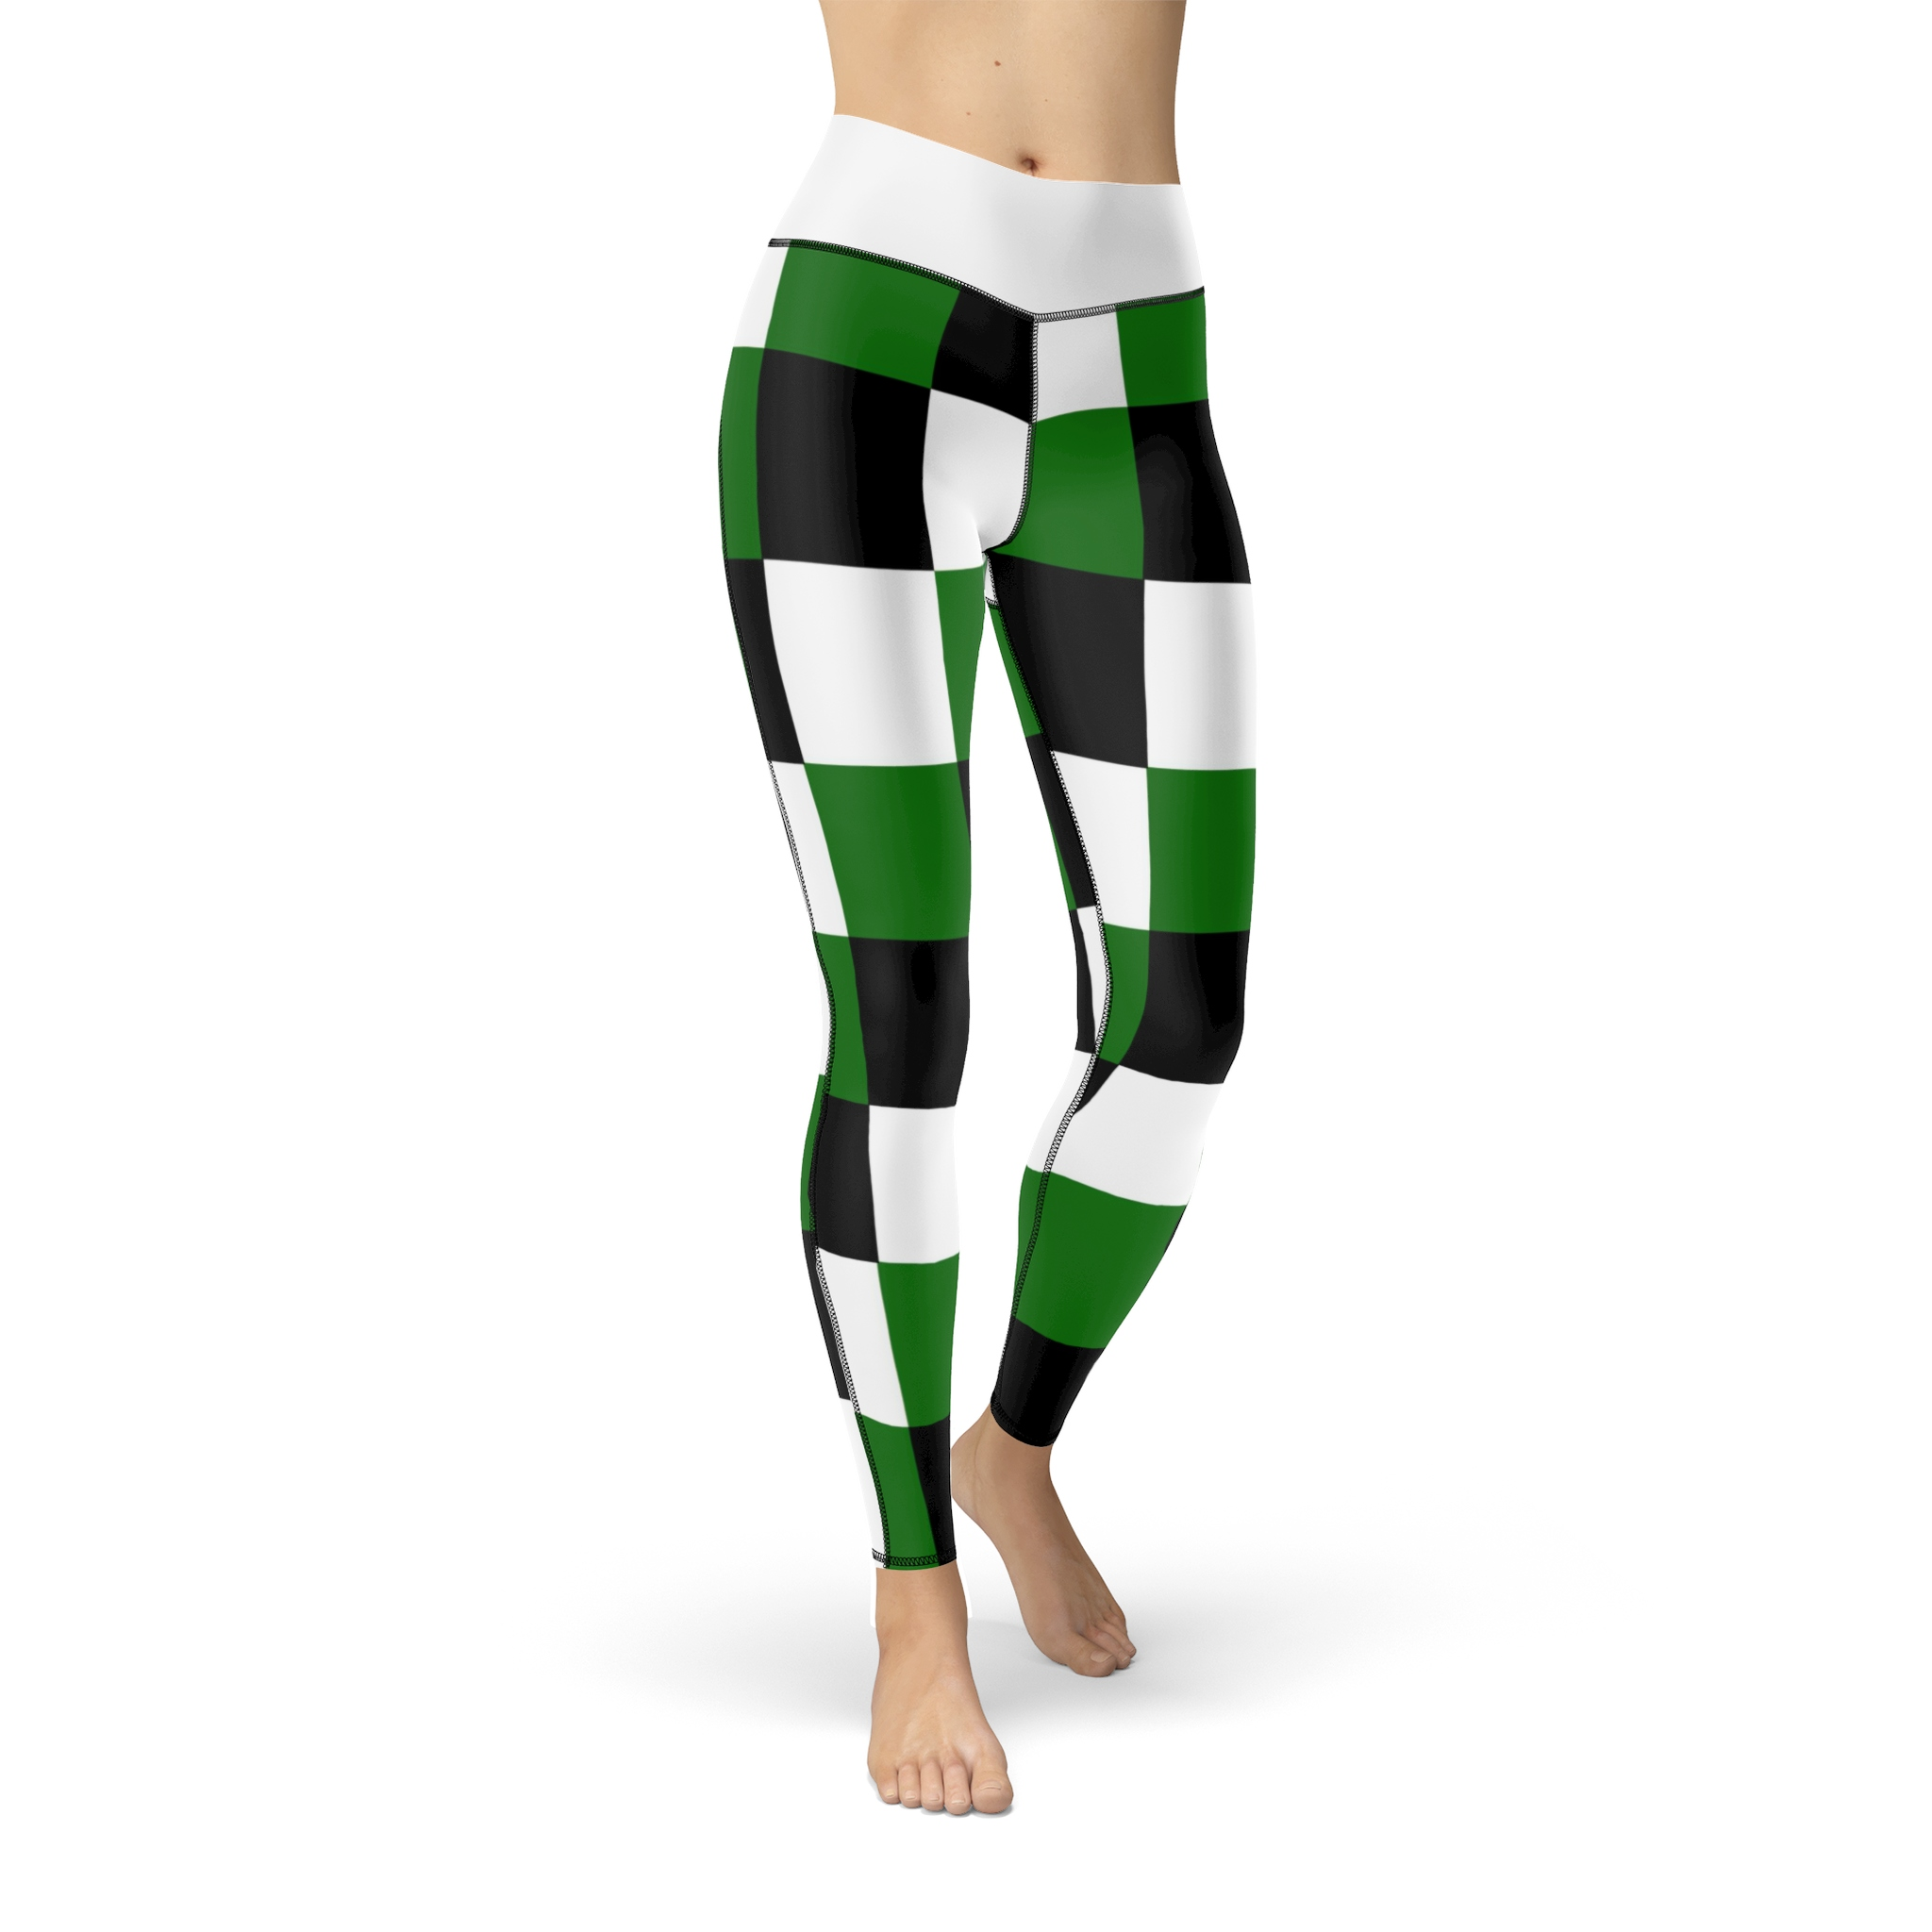 Buissness™ Legs